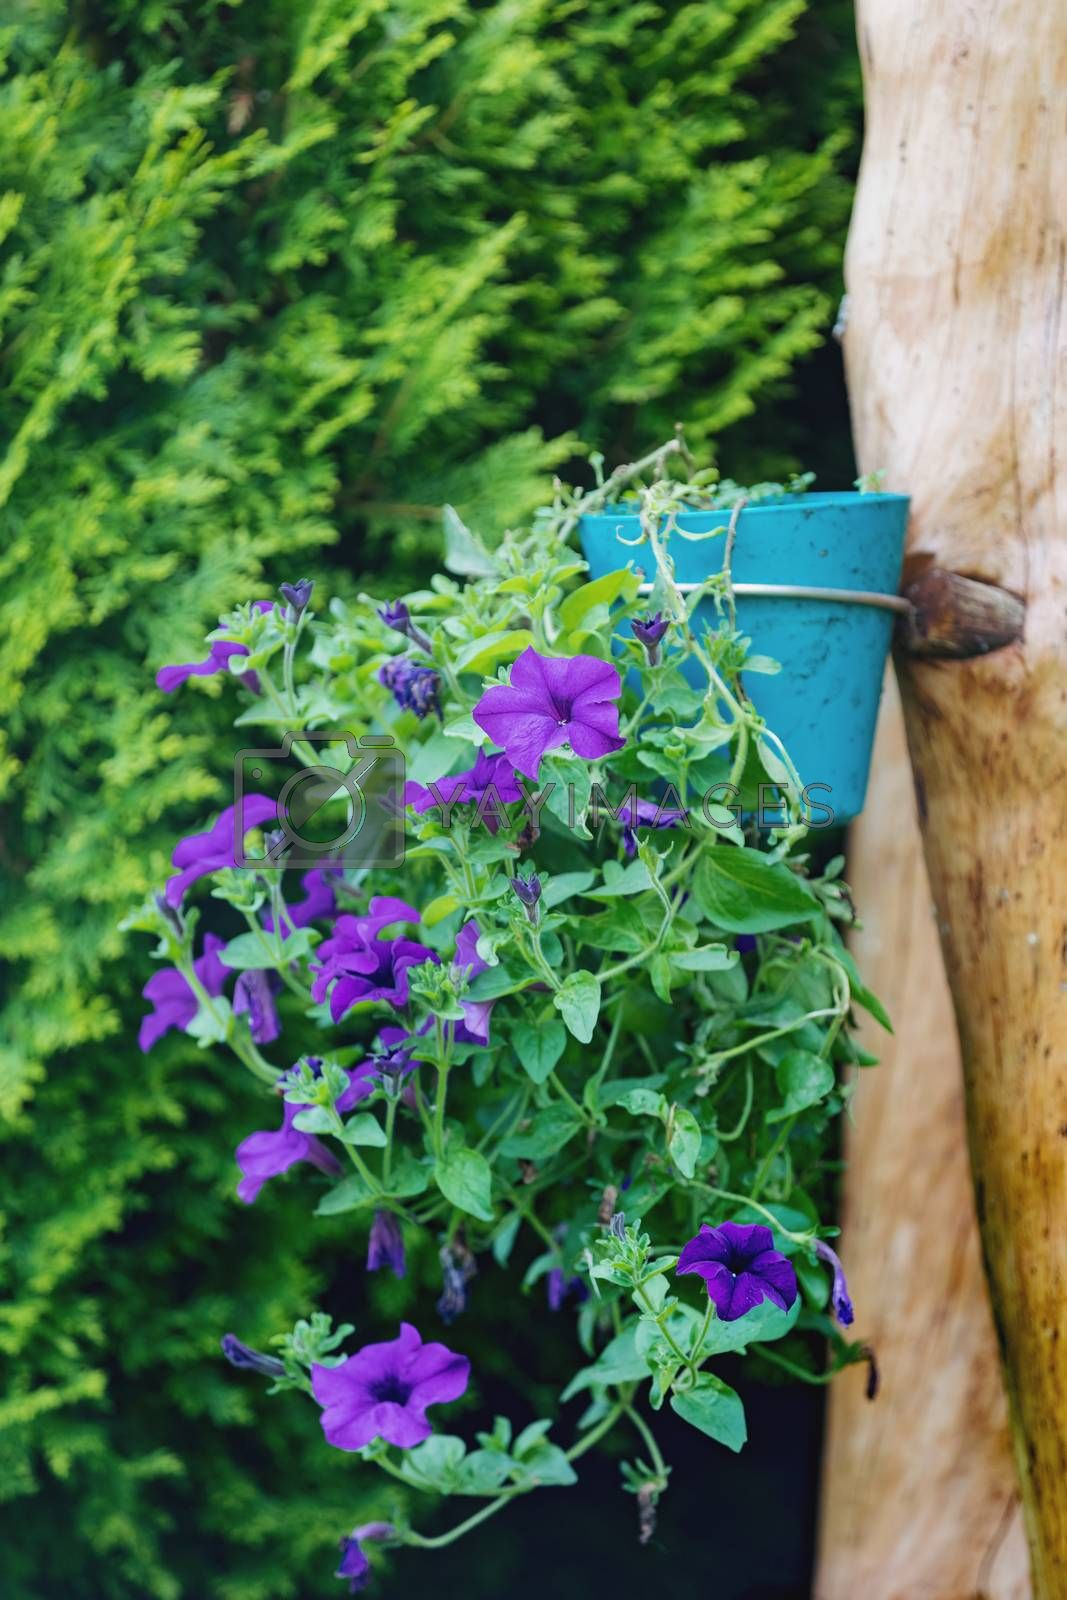 blue flower Petunia Surfinia in late summer garden, hanged in pot on tree trunk